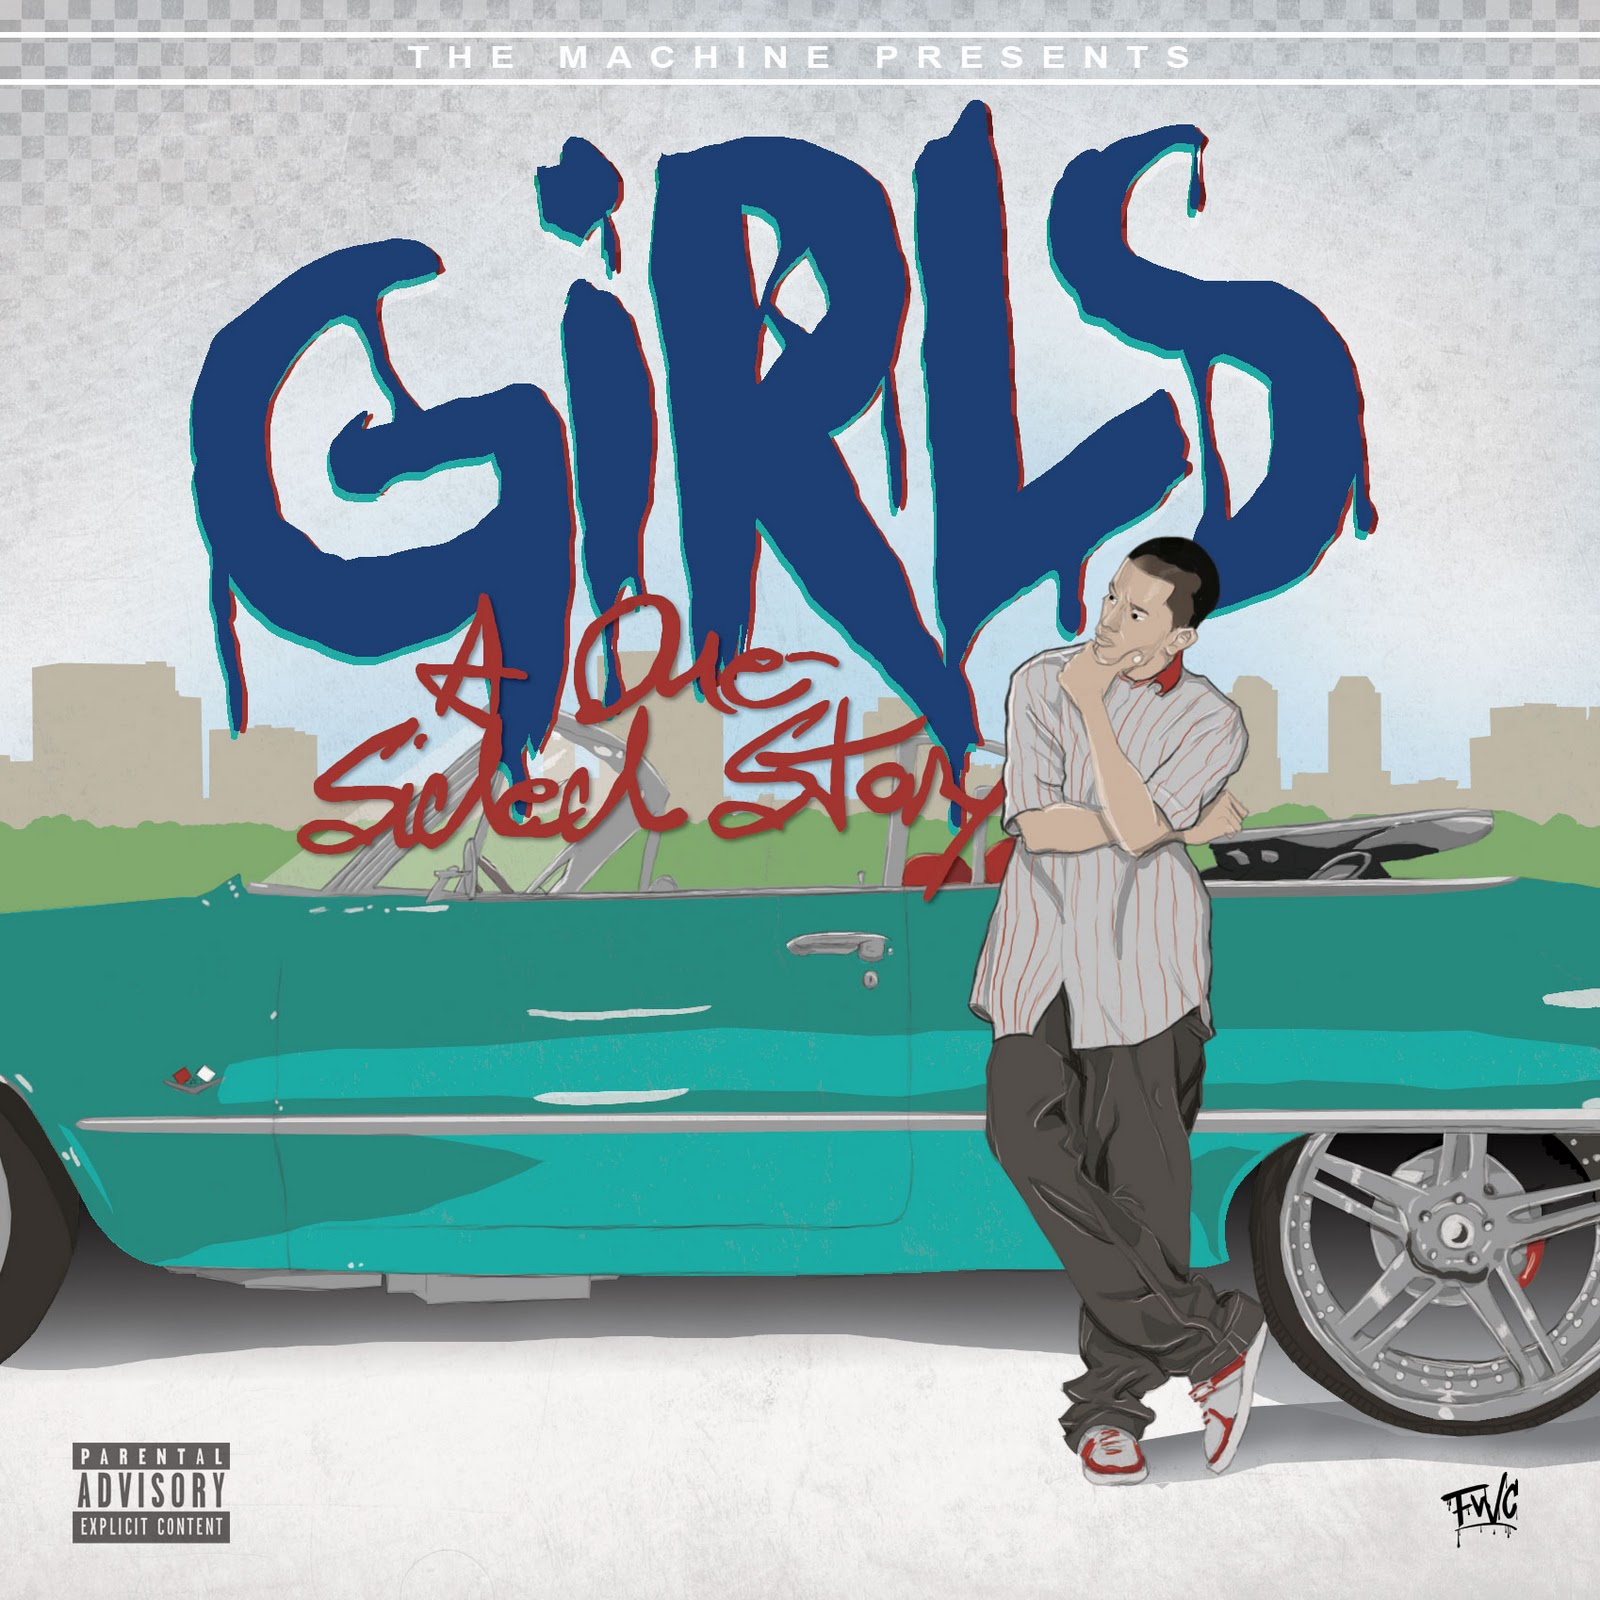 http://3.bp.blogspot.com/-5vxzC0tv5xk/TxCSwXU8pvI/AAAAAAAABXE/DF_xbCNG548/s1600/GIRLS+FRONT+COVER.jpg